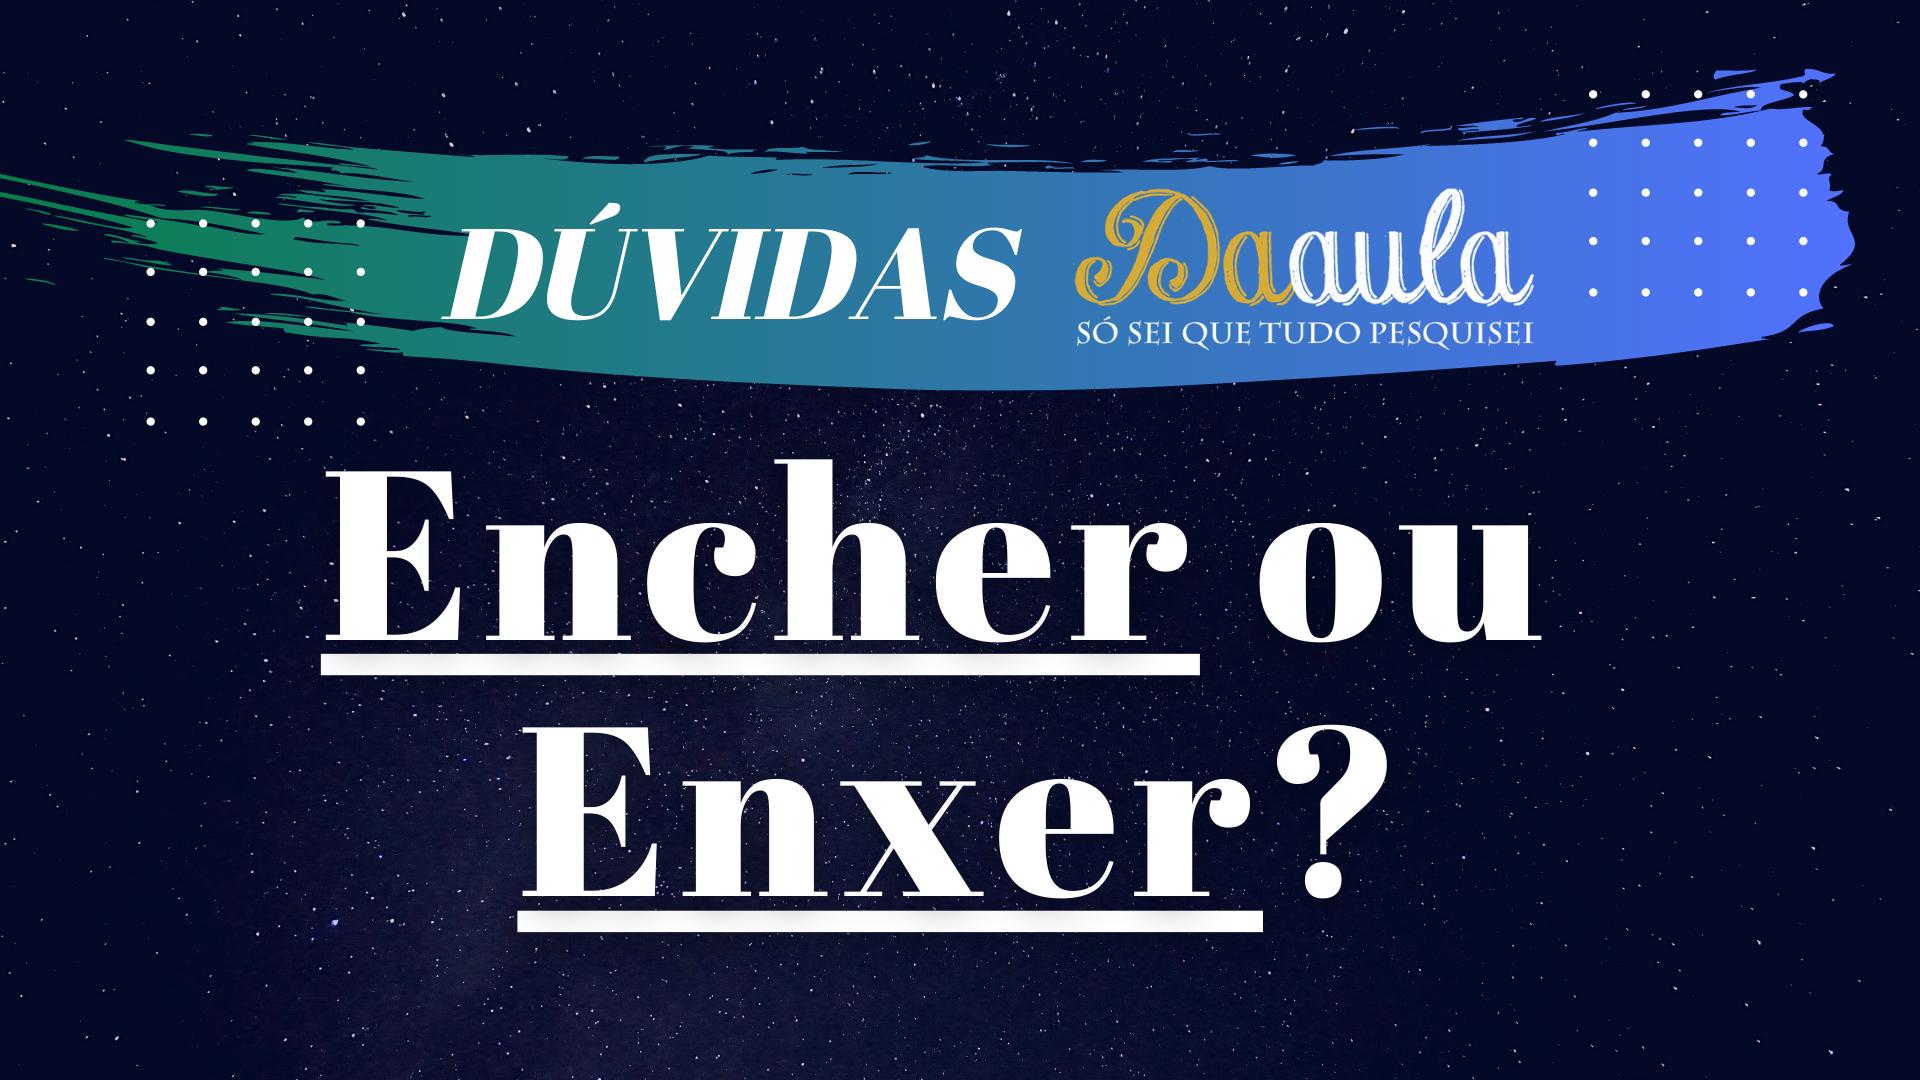 Qual a forma correta, Encher ou Enxer?